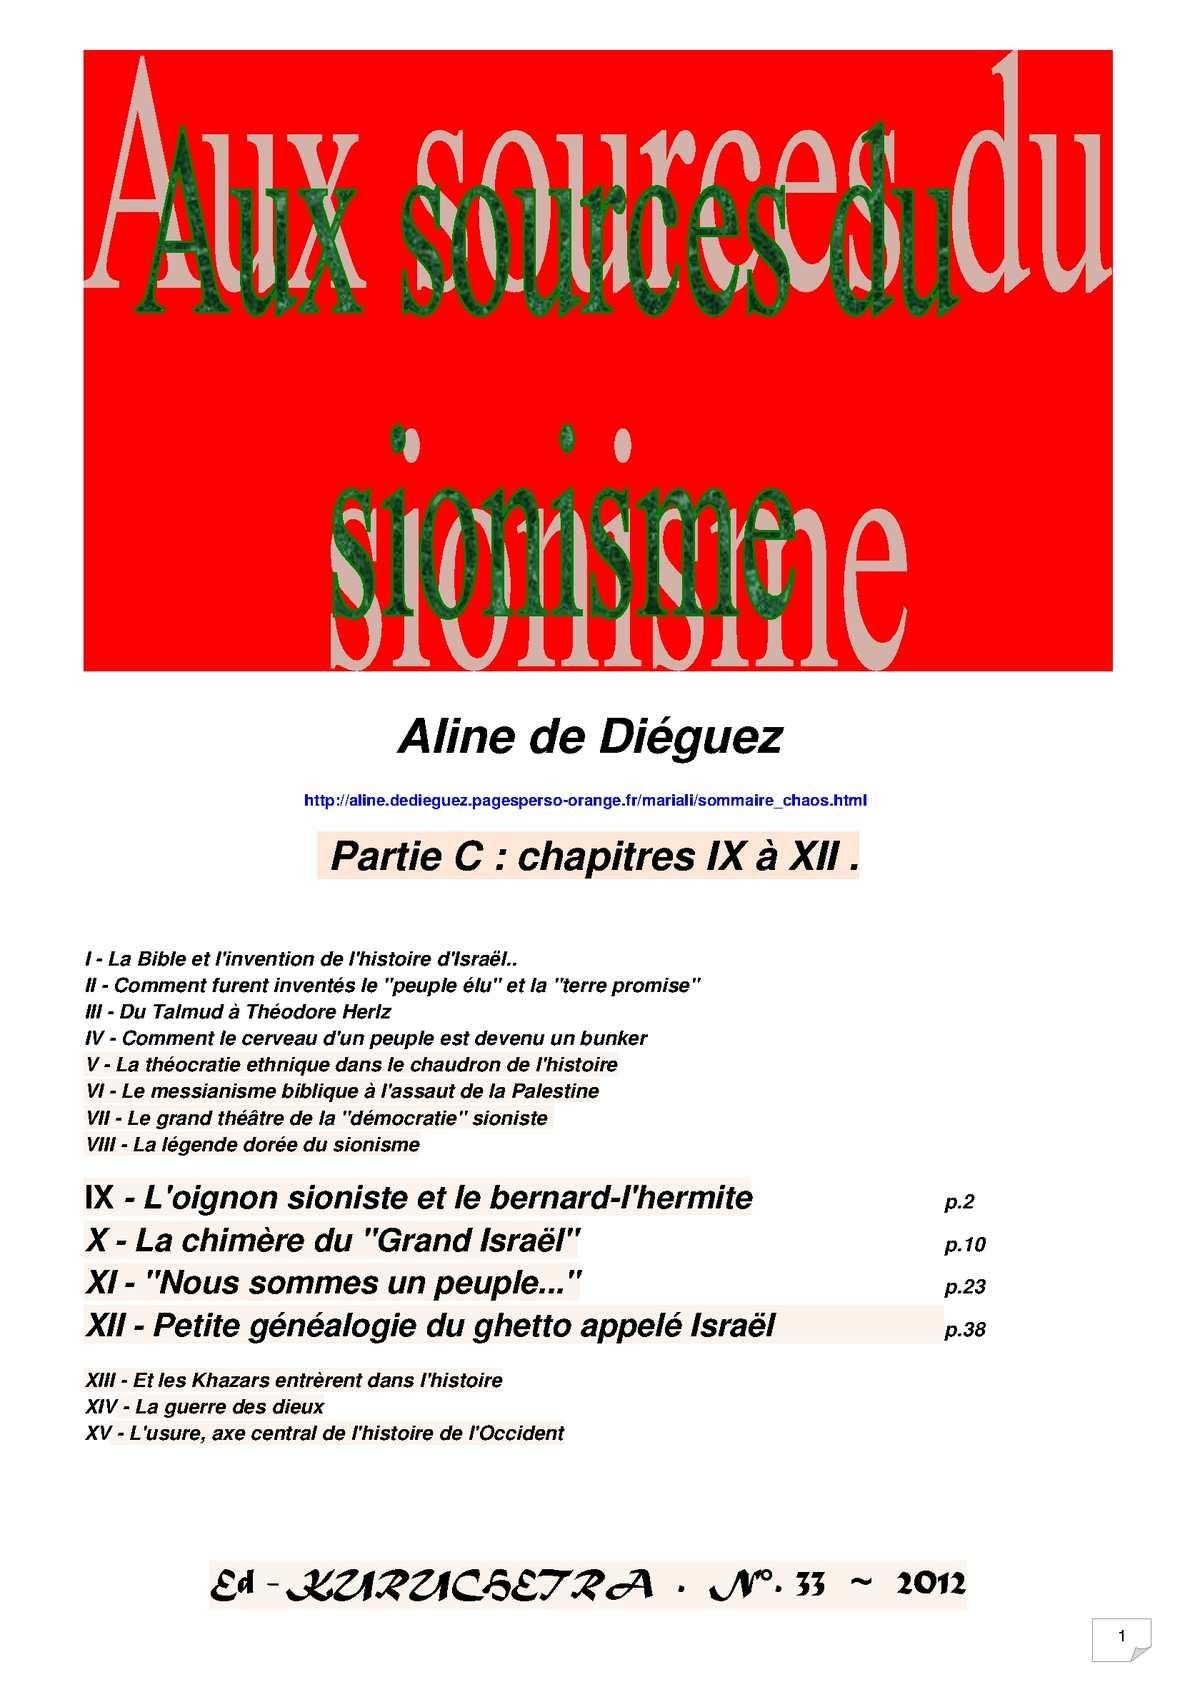 Conan Exiles Chaudron De Siege : conan, exiles, chaudron, siege, Calaméo, KURUCHETRA-Ek23, Sionisme.C